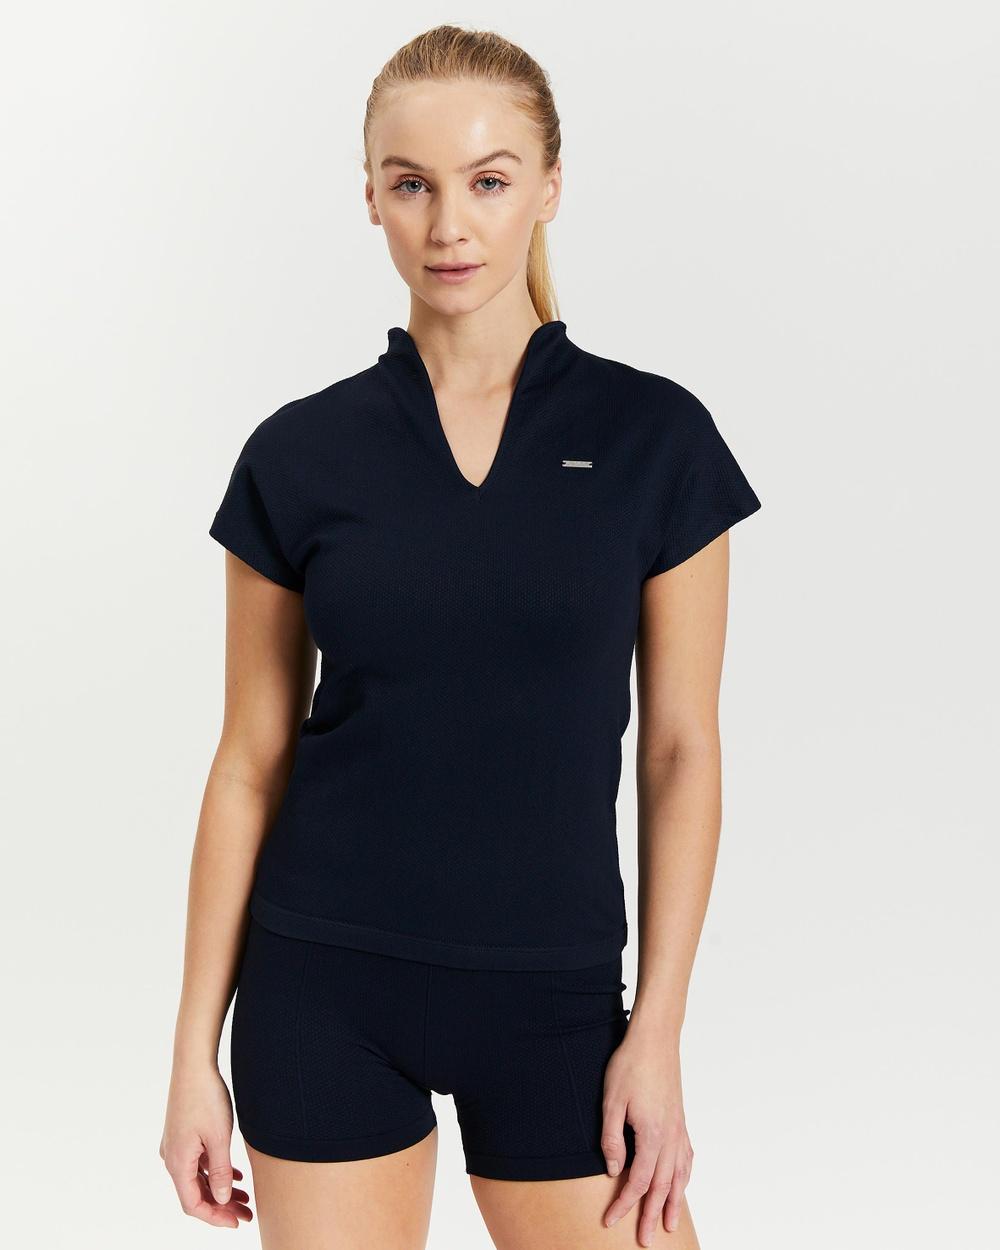 Aim'n Luxe Seamless Polo Shirt Short Sleeve T-Shirts Navy